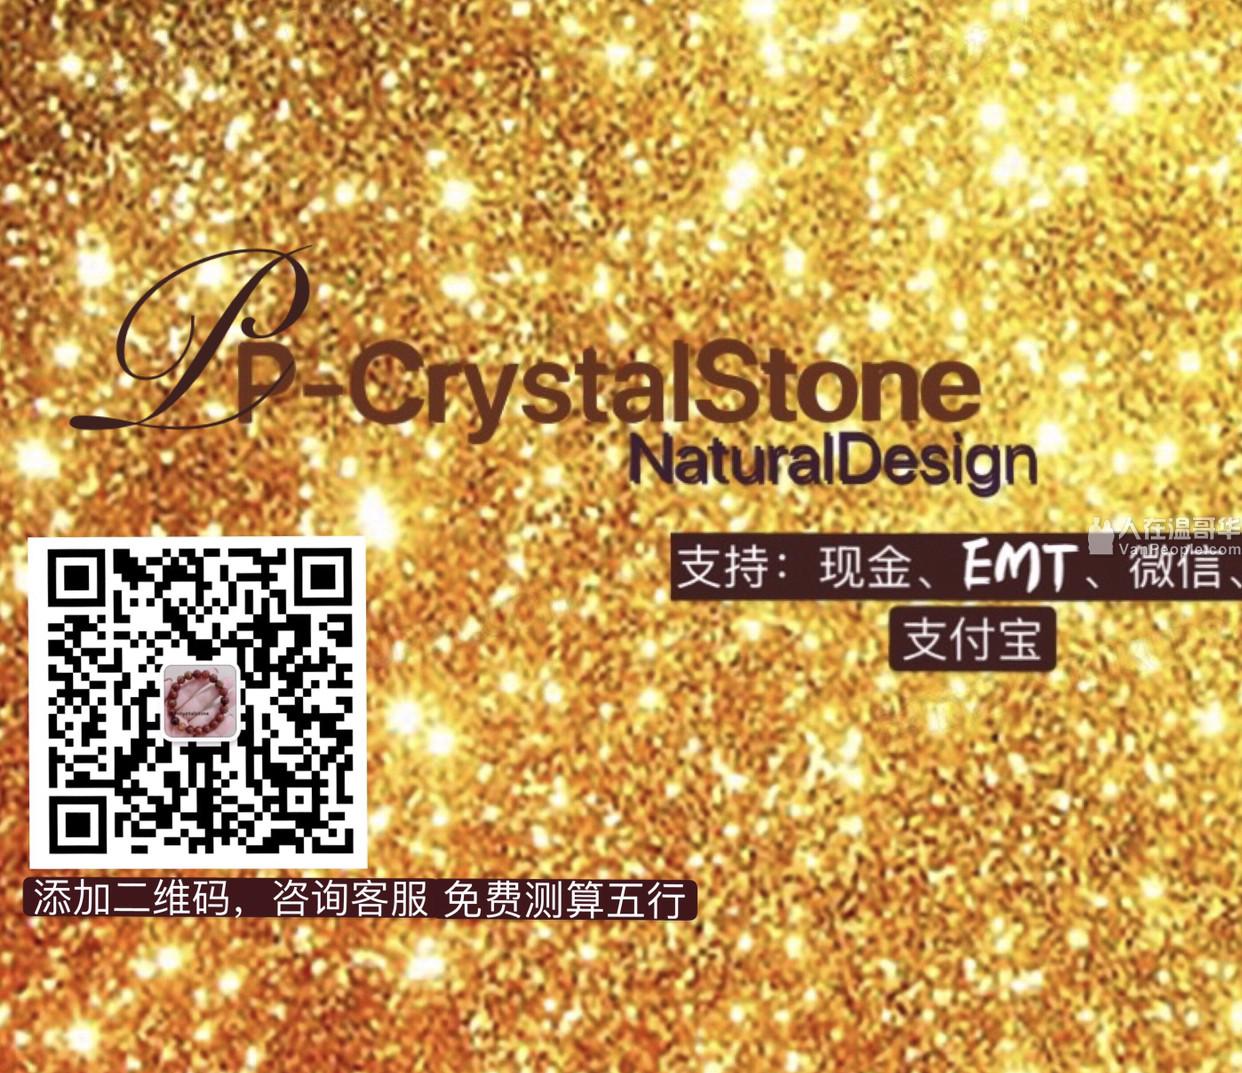 N-crystalstone天然水晶馆,想要新年事业有成 婚姻幸福 金钵满盆 健康平安的看过来啦!不要错过我们!